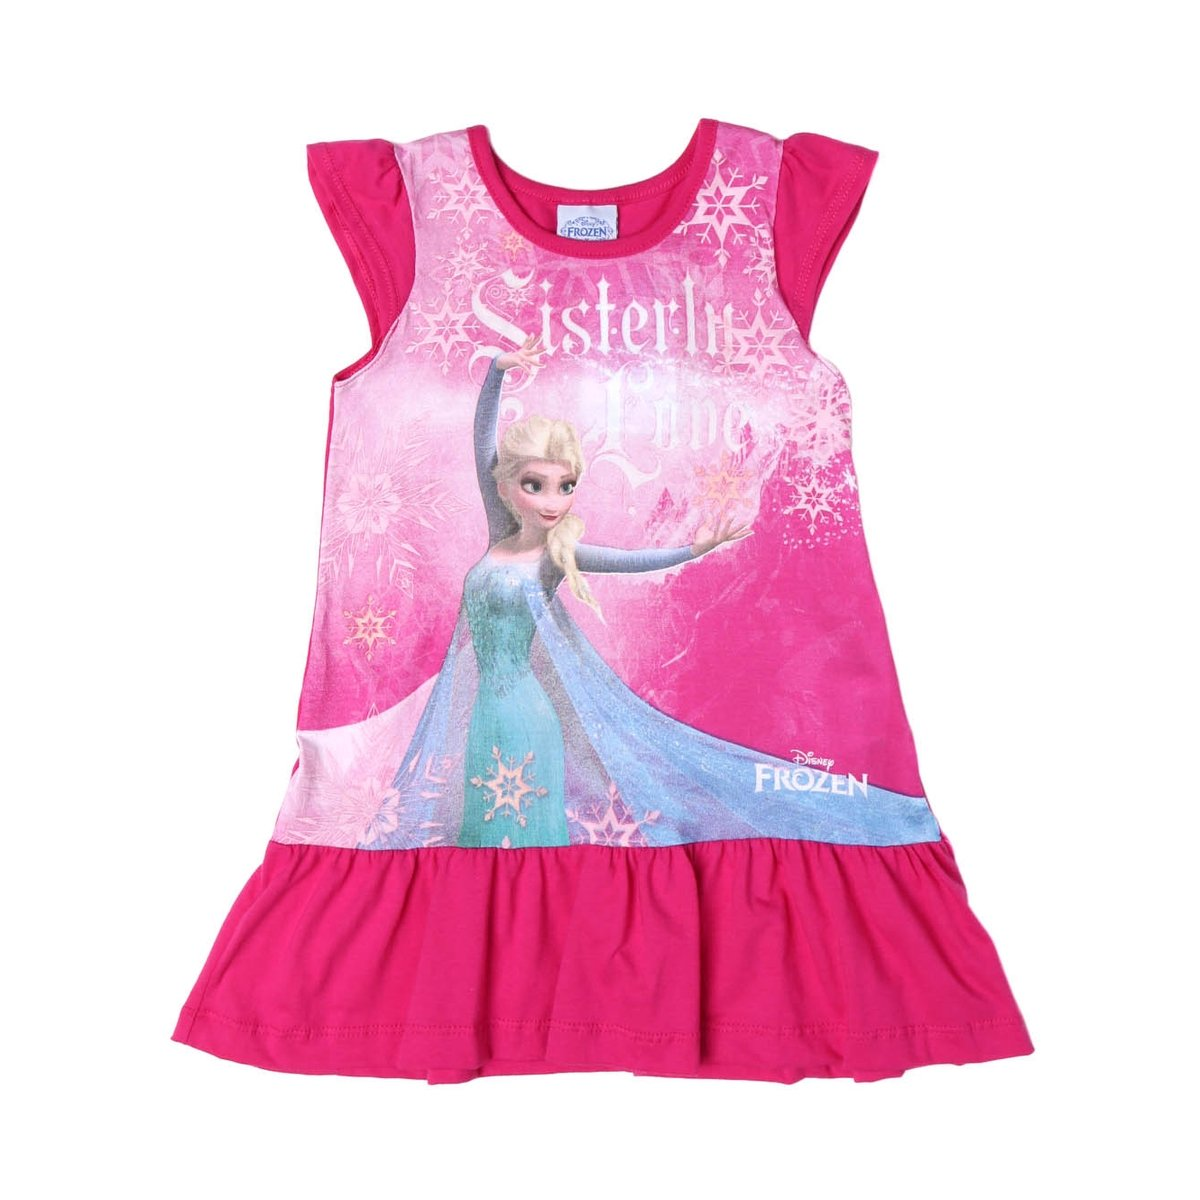 3b416110959c86 Vestido Infantil Para Menina Frozen Rosa pink - Pink